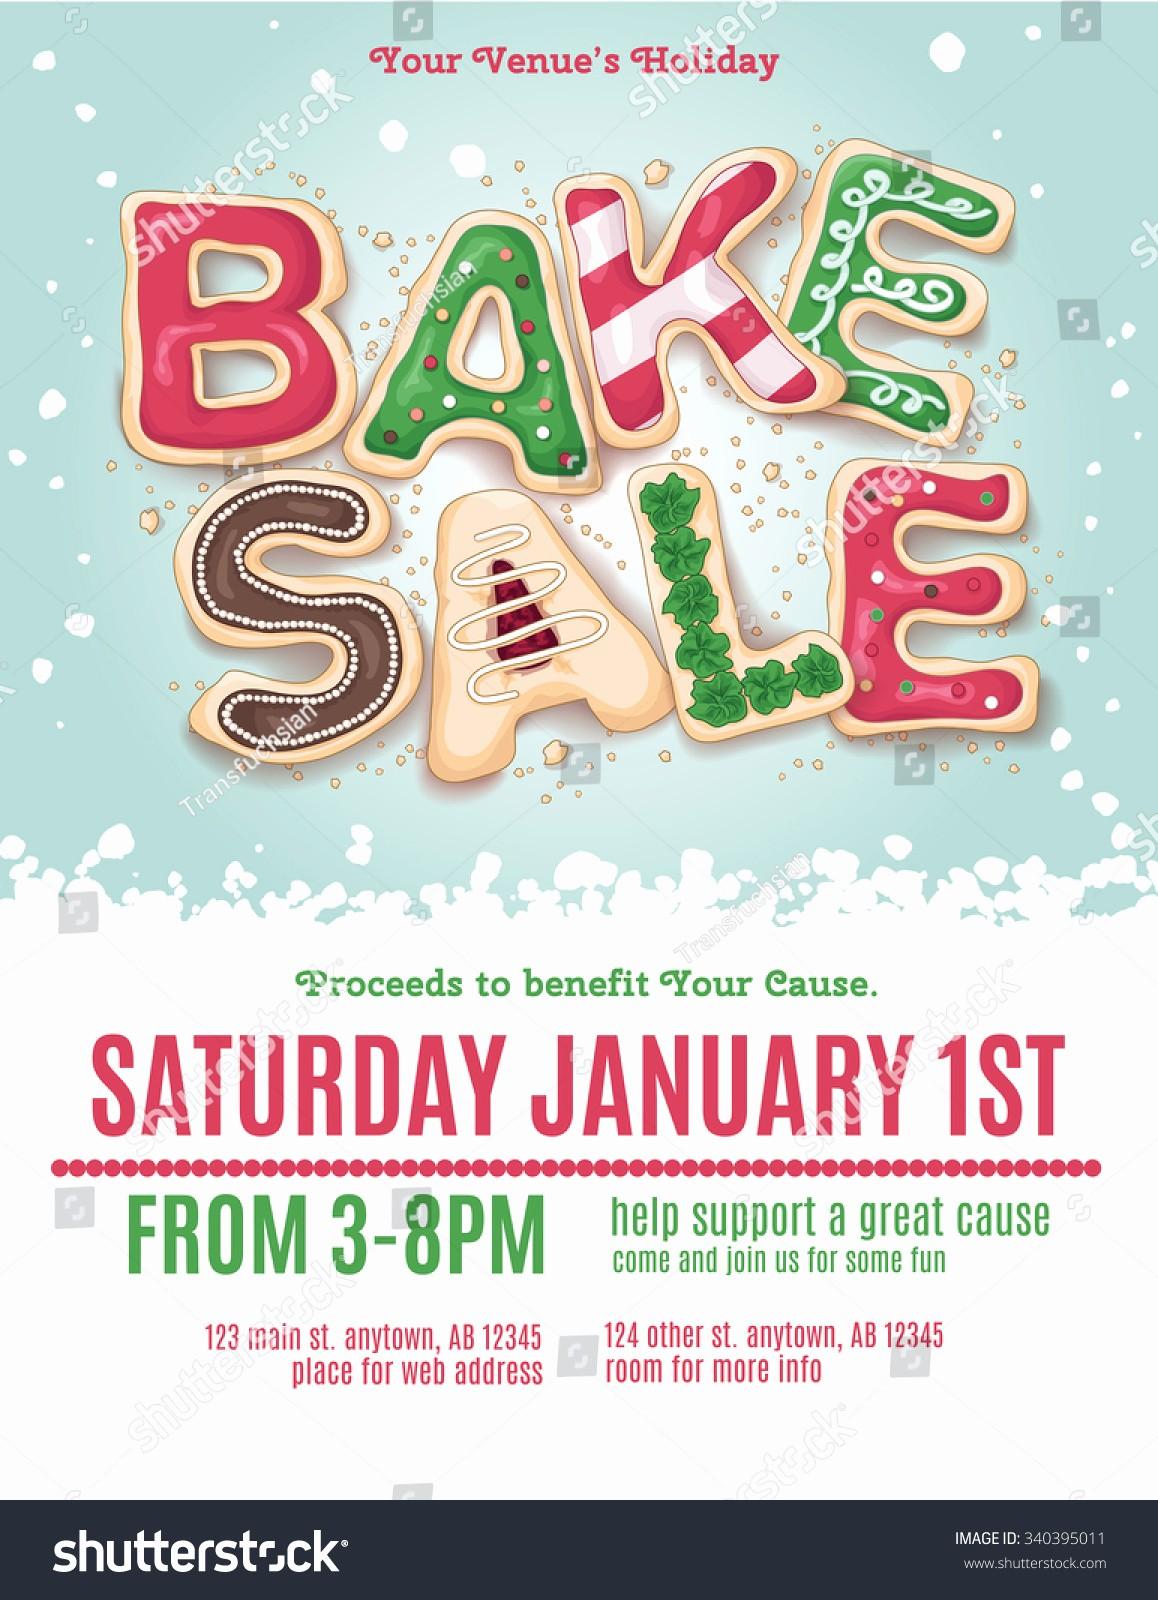 Bake Sale Flyer Template Word Lovely Christmas Holiday Bake Sale Flyer Template Stock Vector